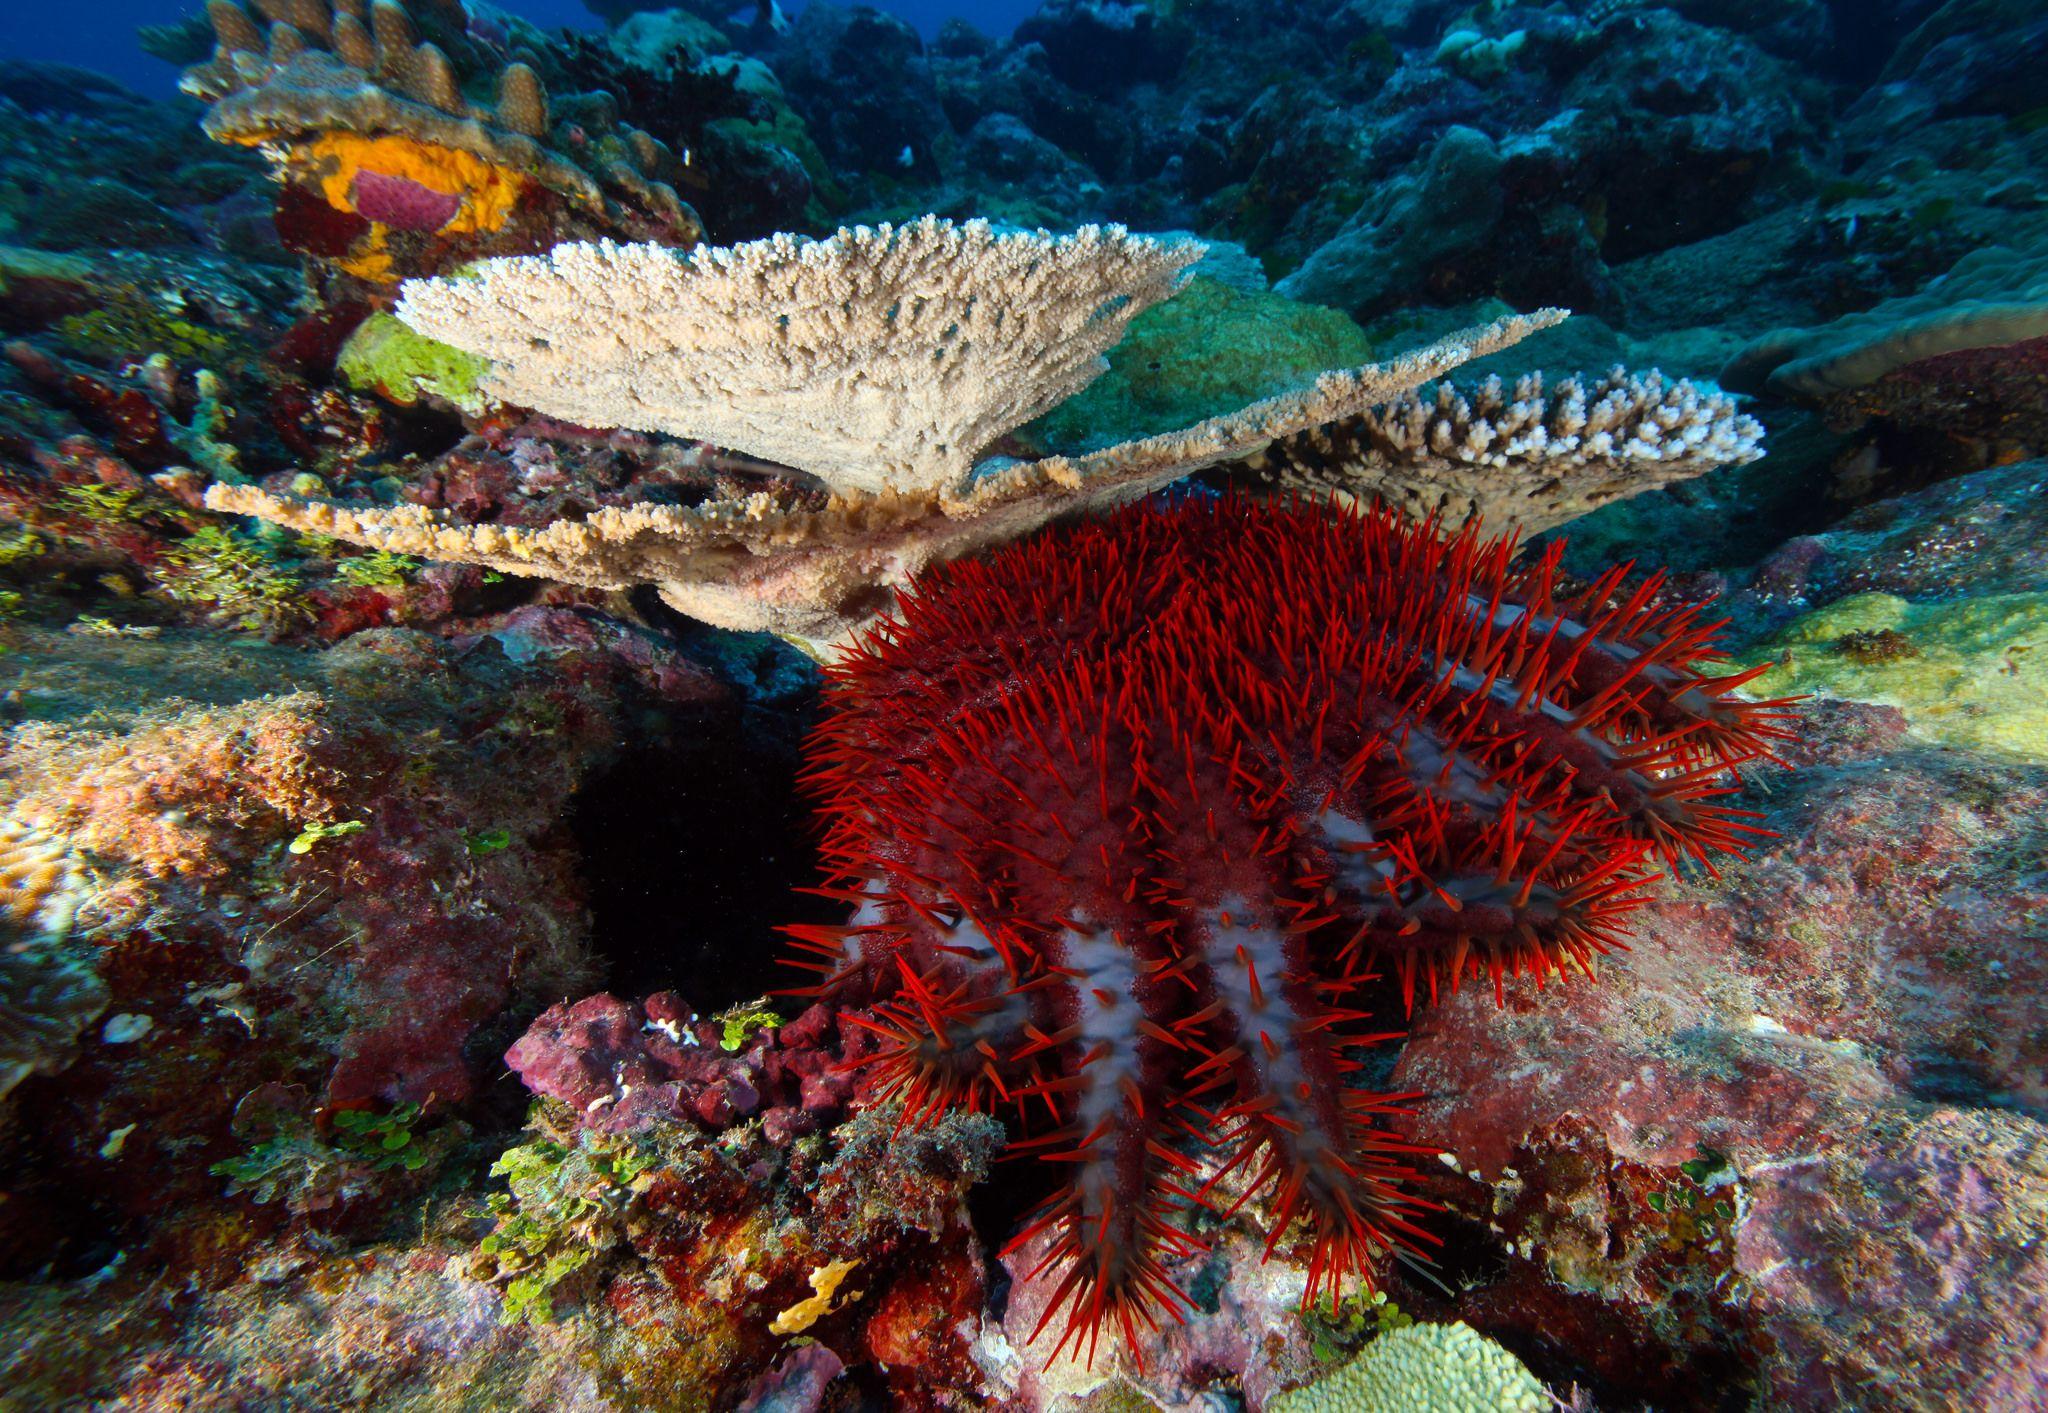 01_19_crown_of_thorns_starfish